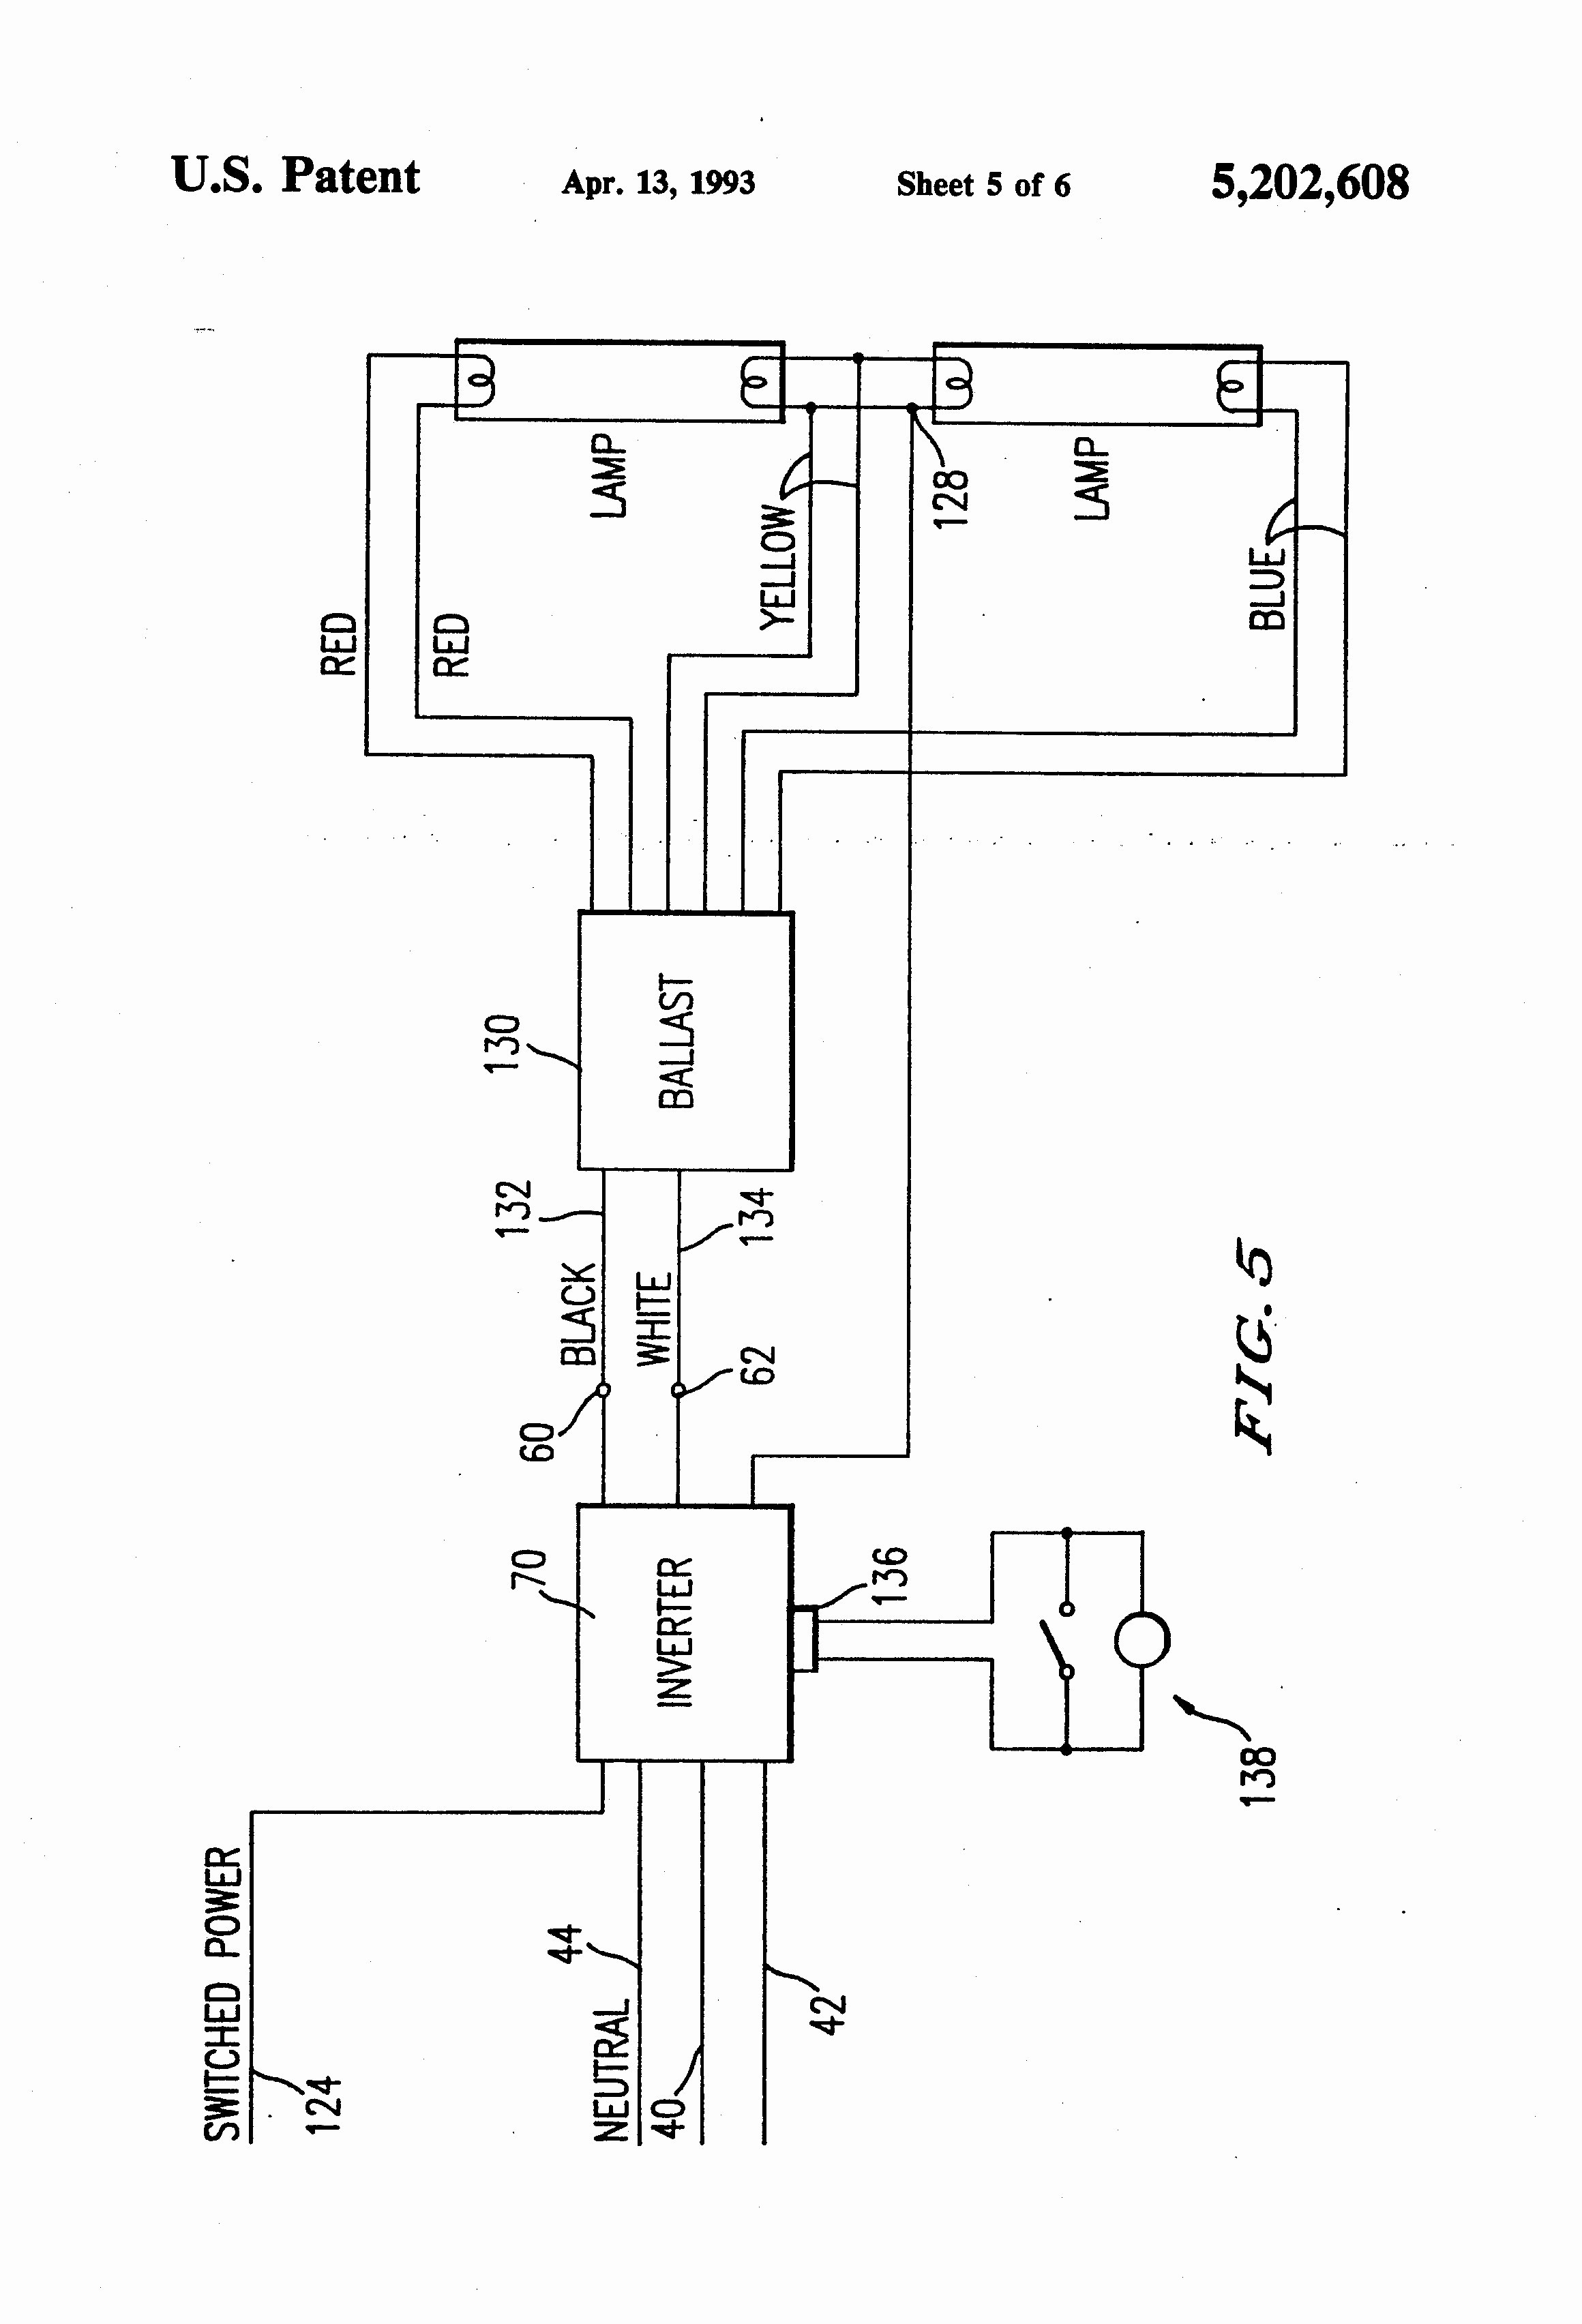 4 Foot Light Fixture Ballast Wiring Diagram | Wiring Diagram - 4 Lamp 2 Ballast Wiring Diagram